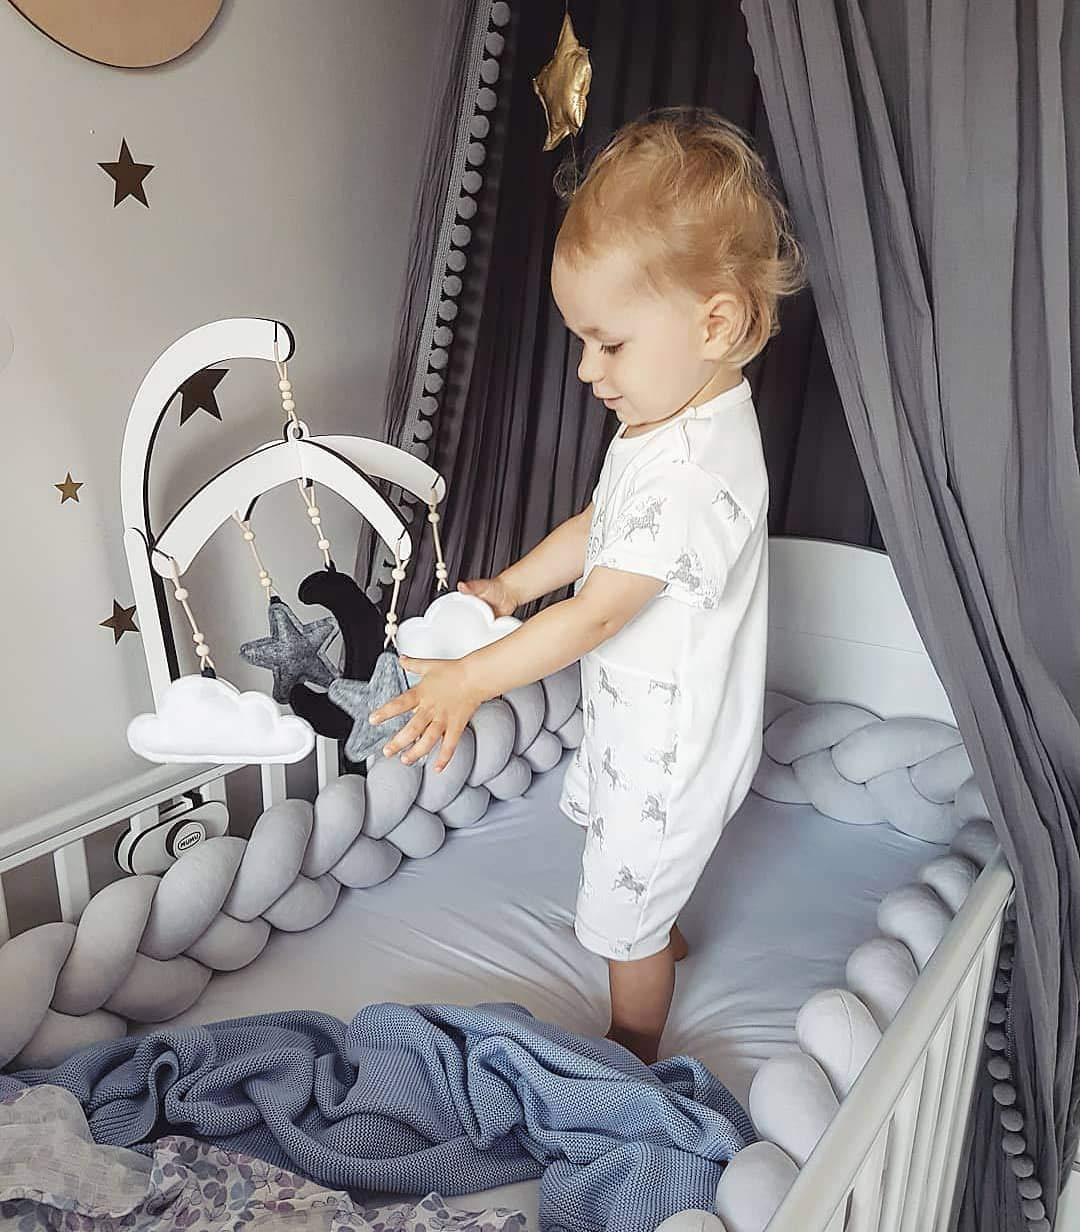 MOMAID Baby Braided Crib Bumper Knotted Plush Soft Nursery Toddler Crib Bedding Sets Decor Handmade Cradle Newborn Pillow Snuggle Sleep Bed Pads¡